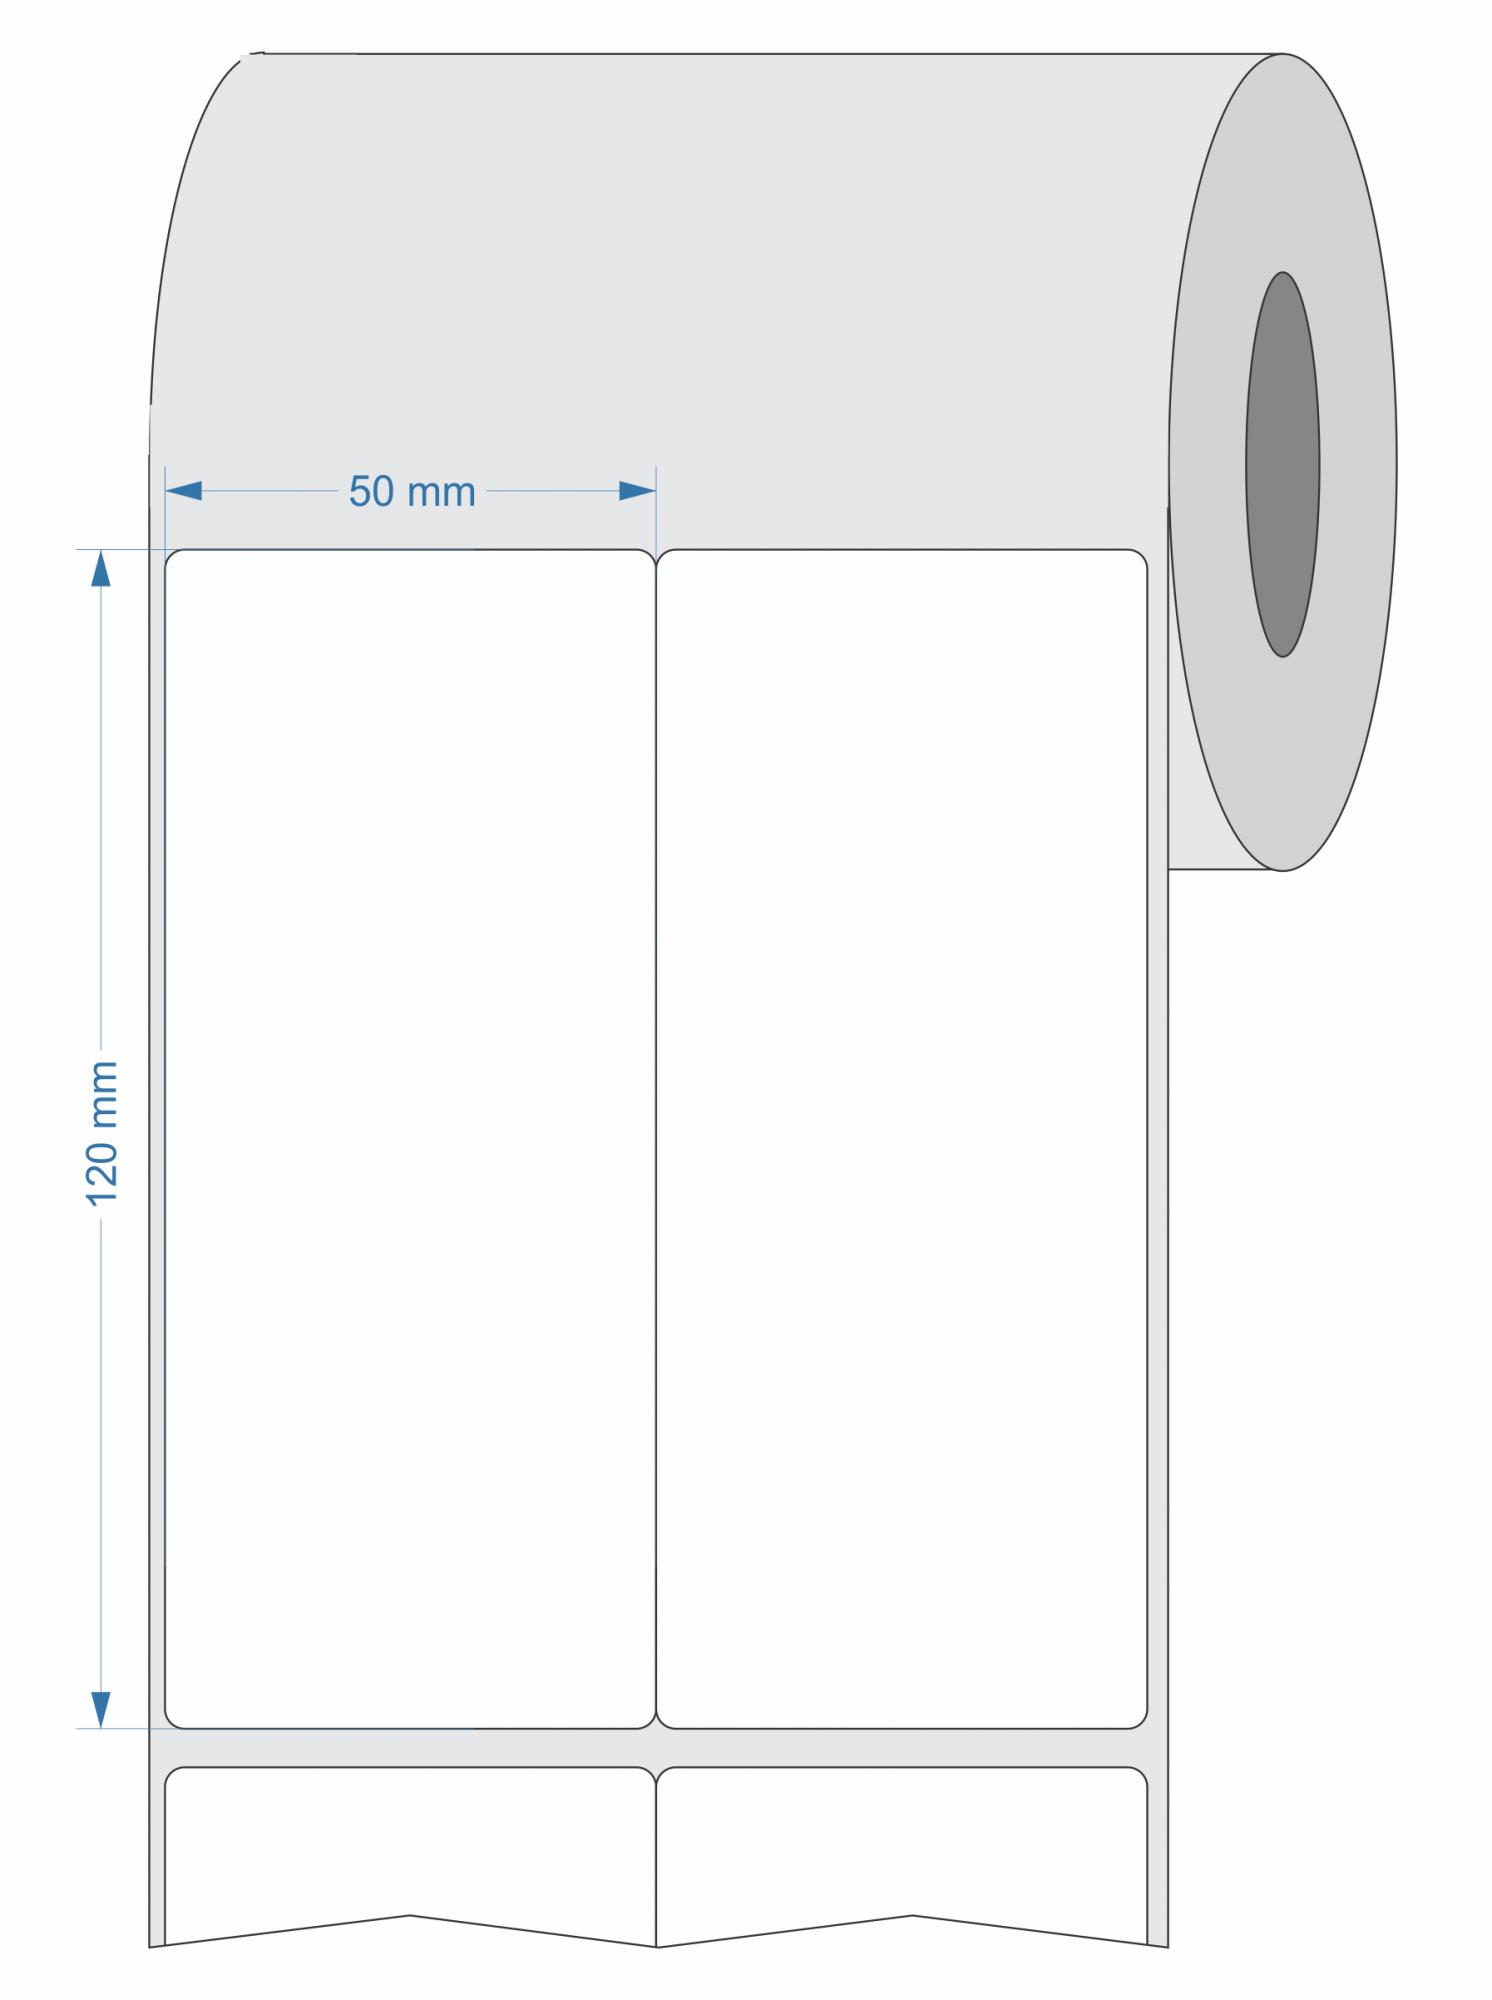 Etiquetas para Rastreabilidade Adesivas 50x120 mm BOPP - 10 Rolos